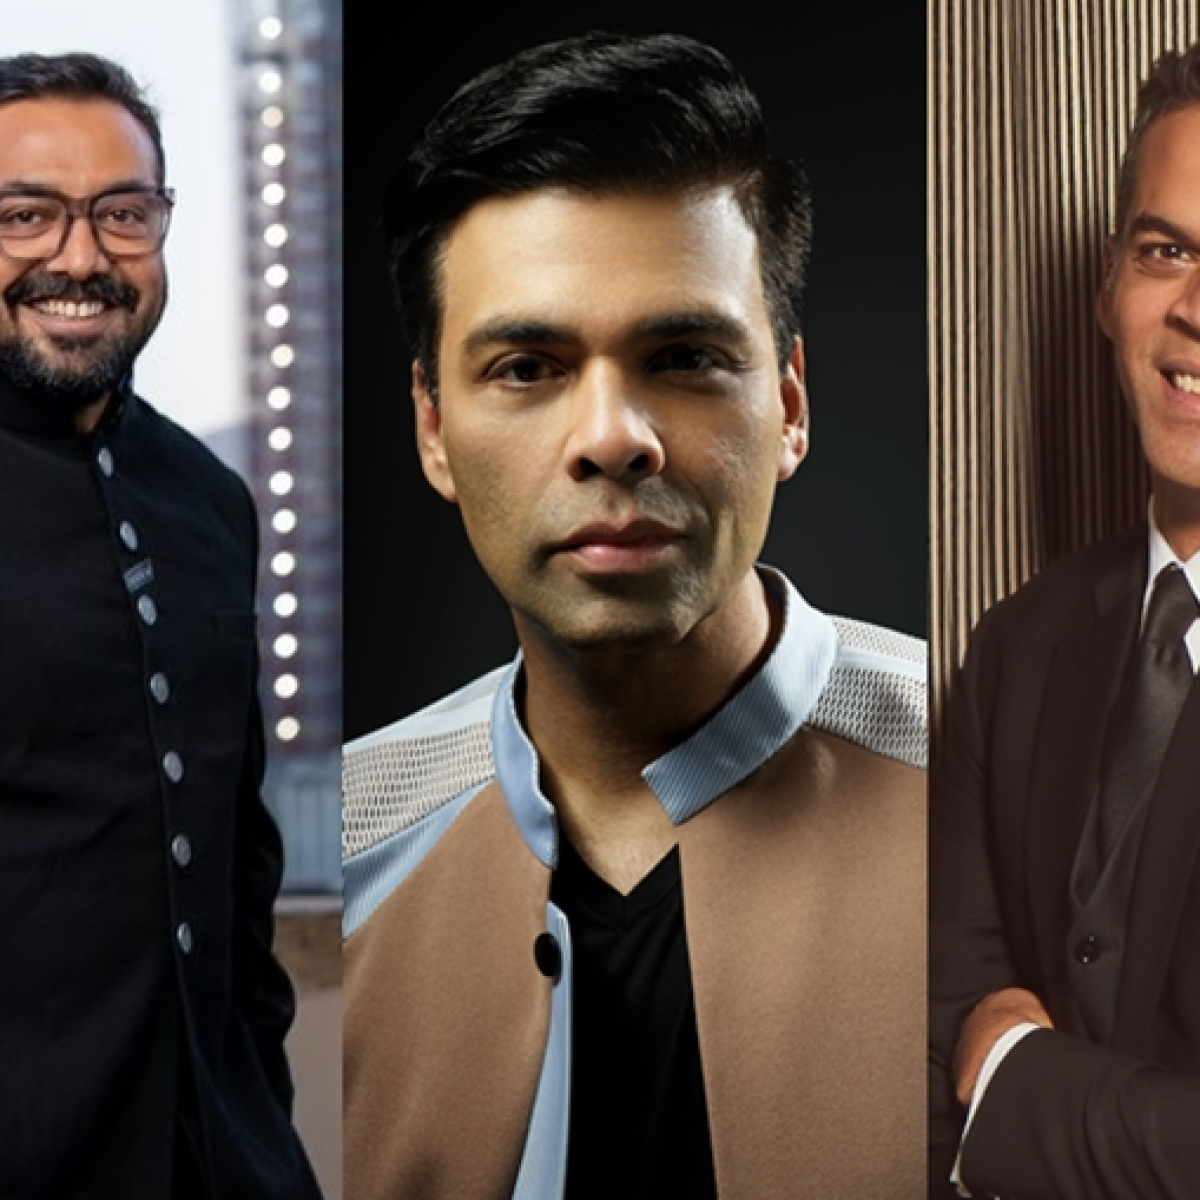 Netflix announces three new films from Anurag Kashyap, Karan Johar and Vikramaditya Motwane